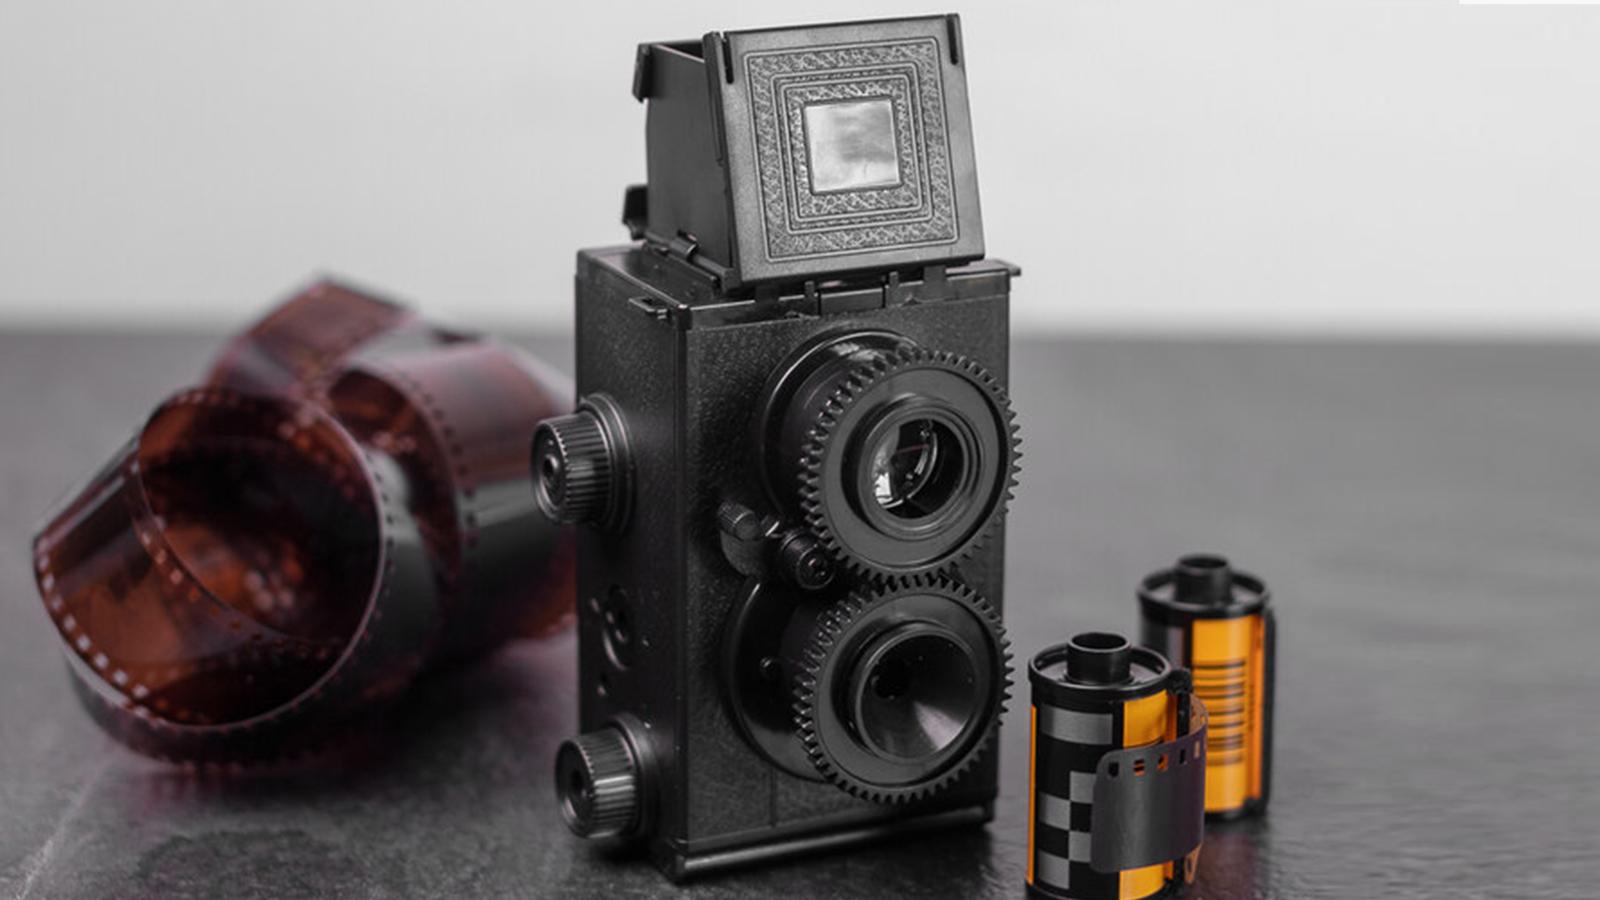 Haynes Classic Camera Making Kit